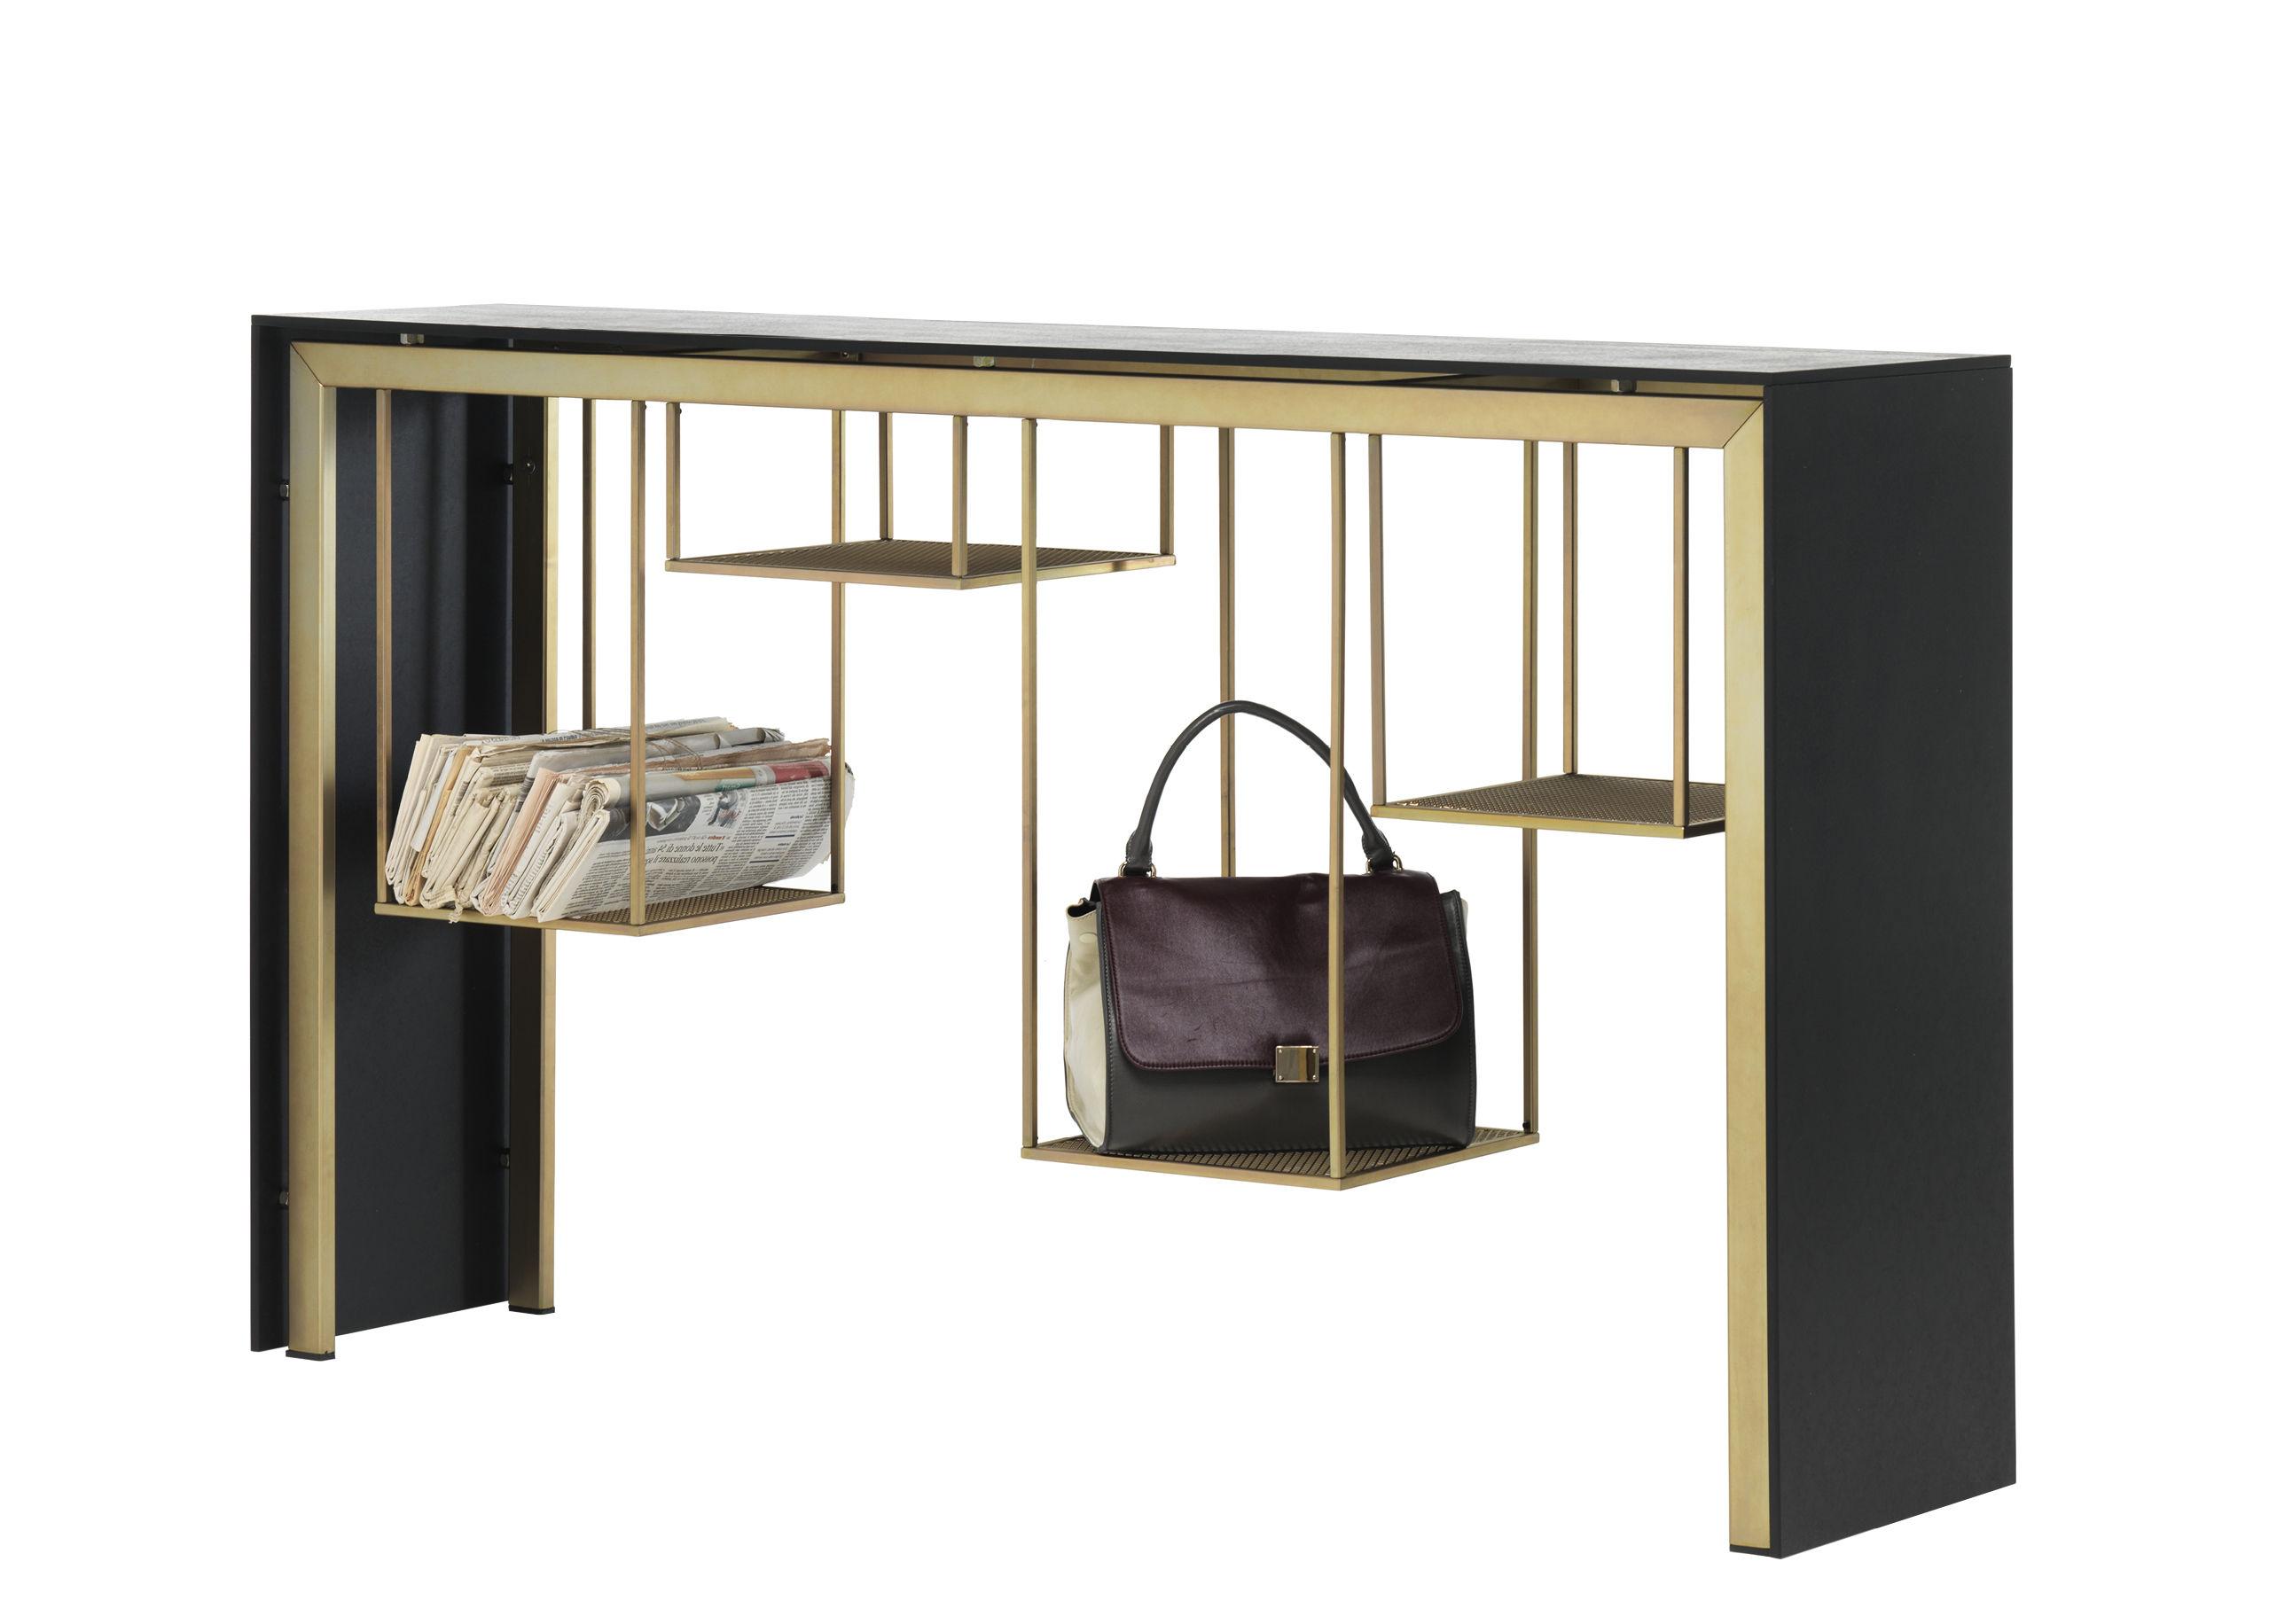 konsole tokyo von mogg grau schwarz gold made in design. Black Bedroom Furniture Sets. Home Design Ideas